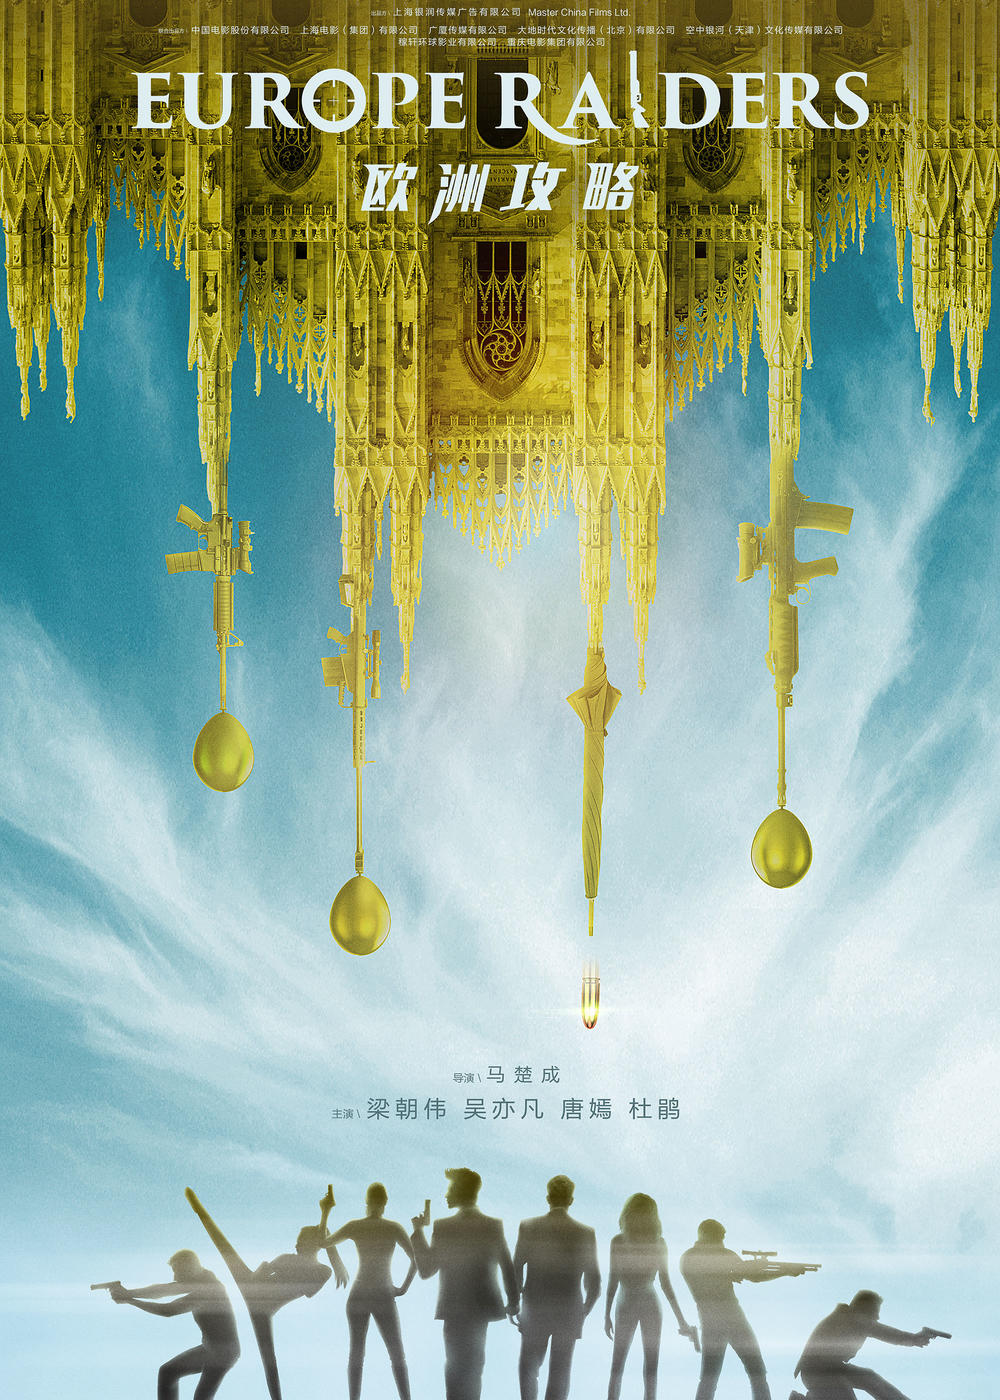 Europe Raiders 2018 Full Chinese Movie Download 720p 750MB Free